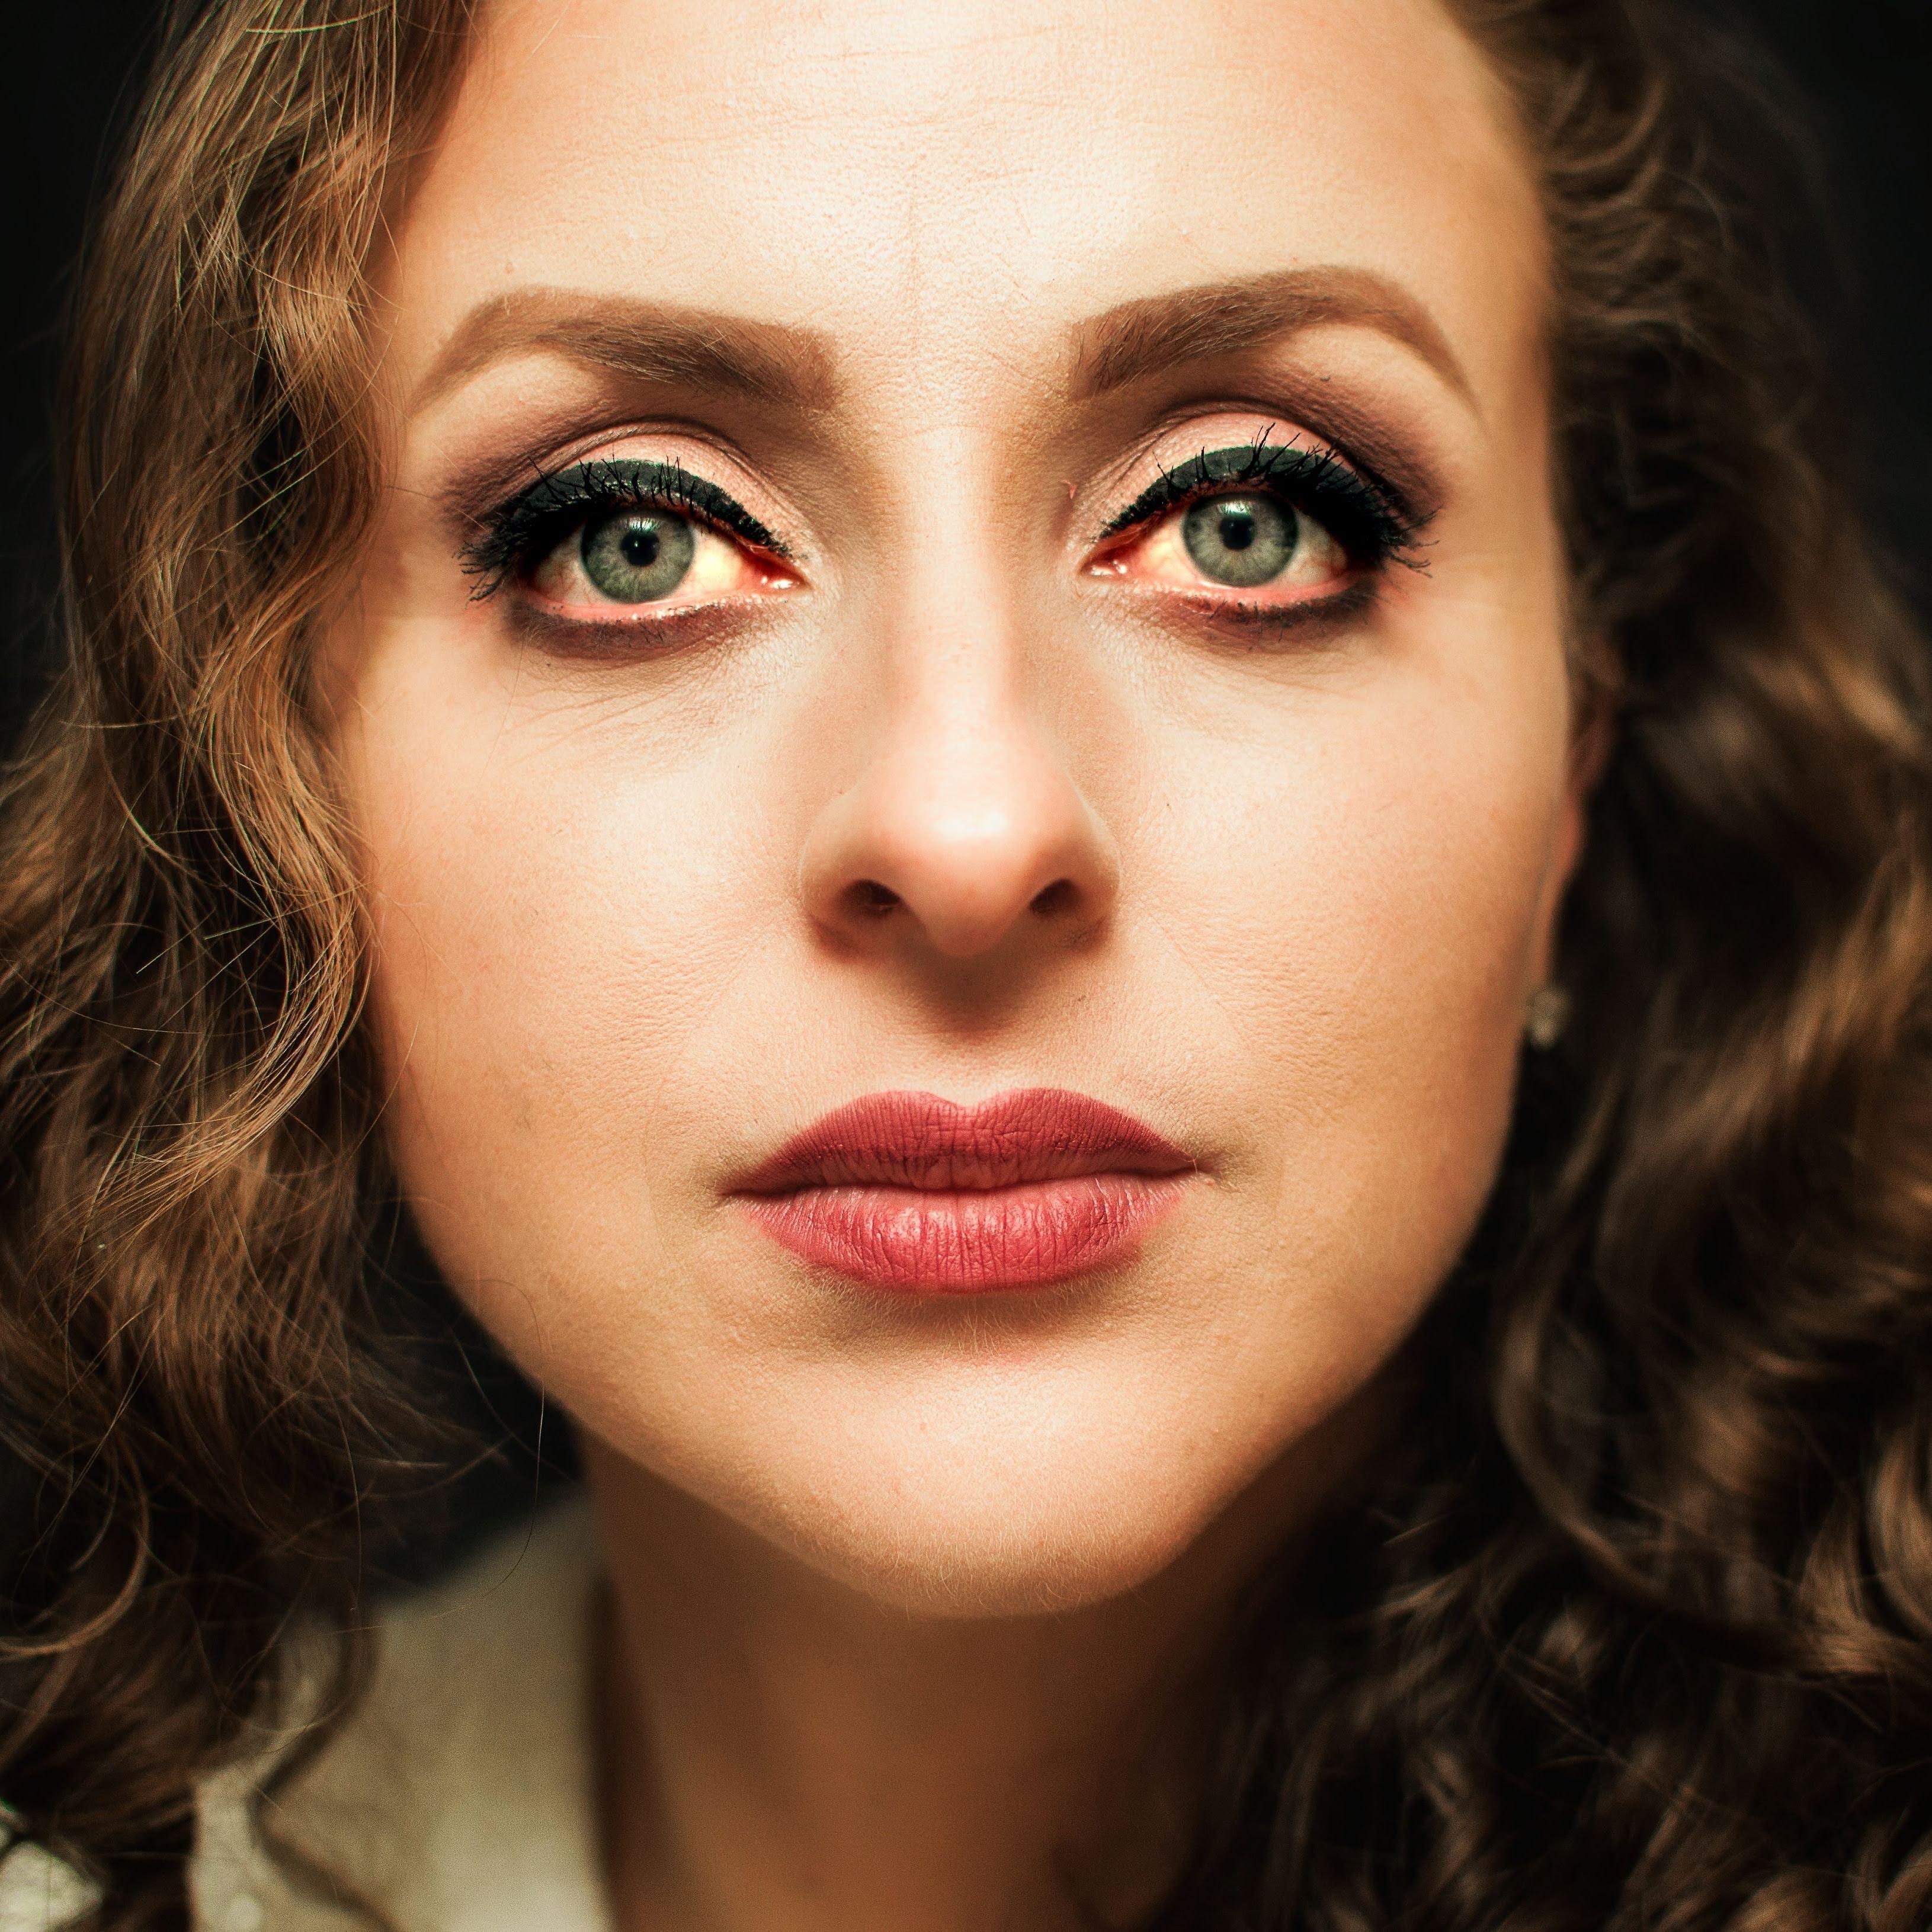 Close-Up Photo of Woman With Red Lipstick \u00b7 Free Stock Photo